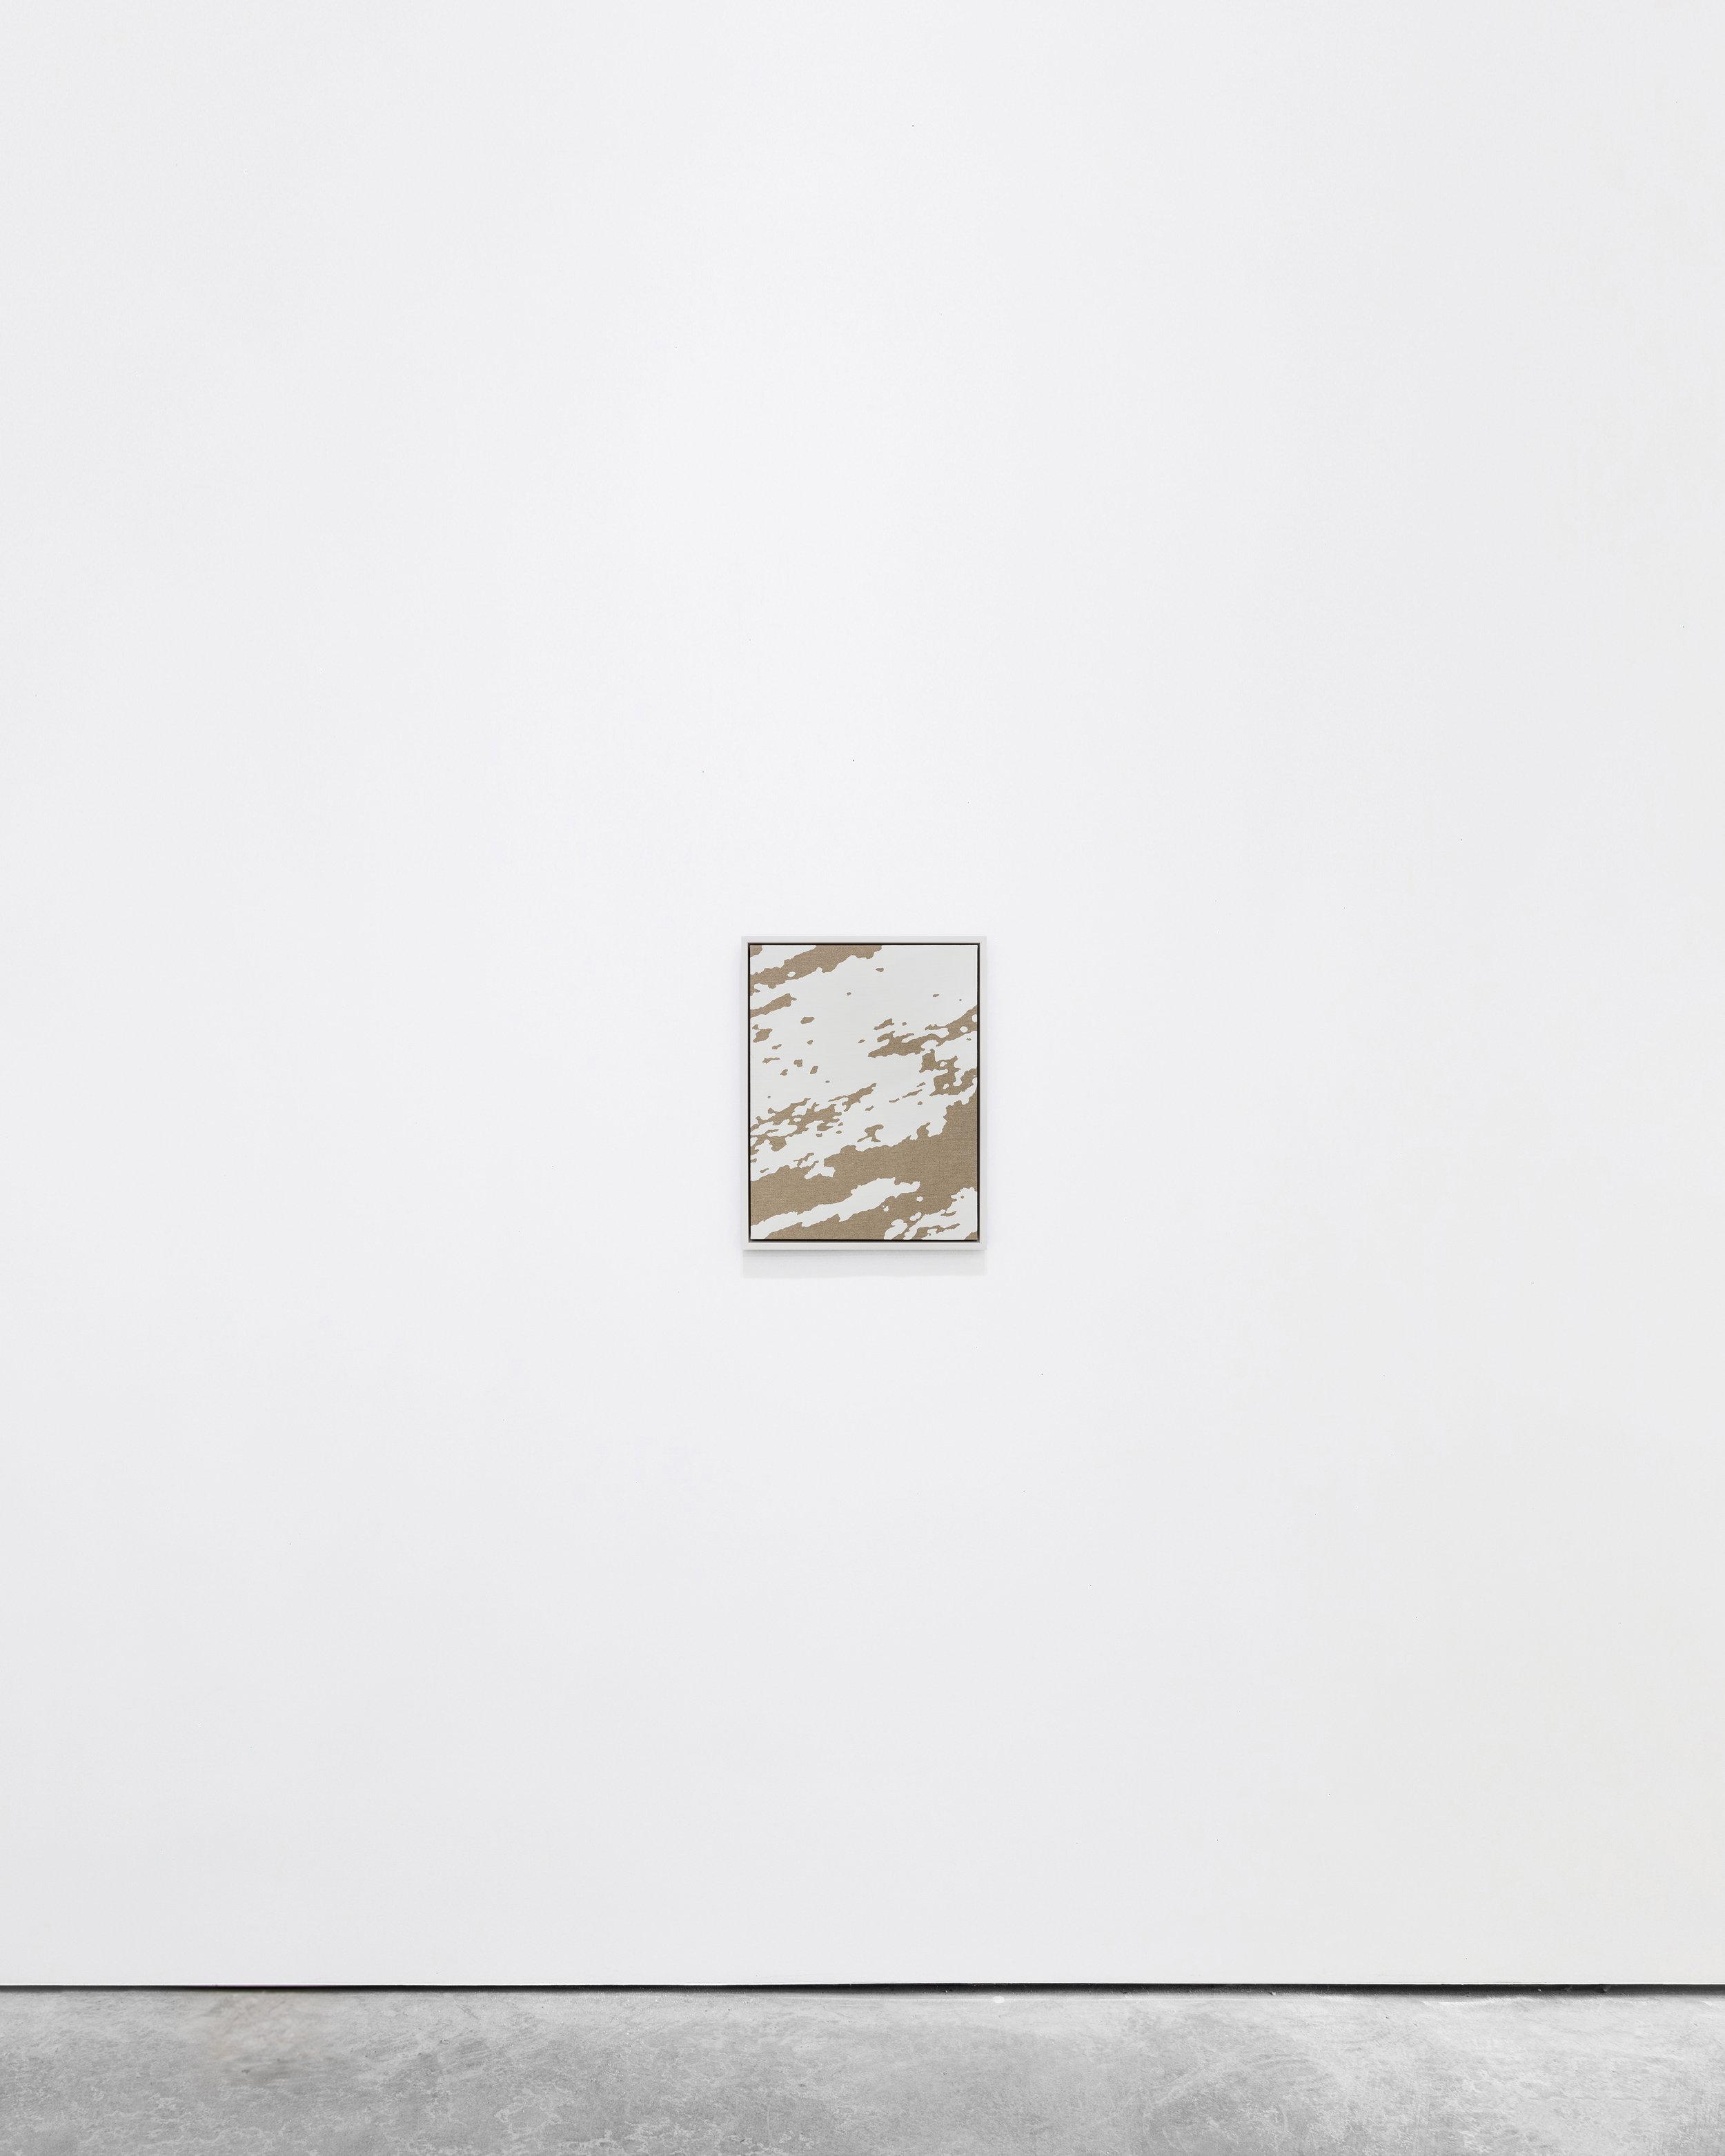 Pedro Matos  Under a Pile of Winter,  2016 Acrylic enamel on unprimed linen, wood frame 40 x 30 cm